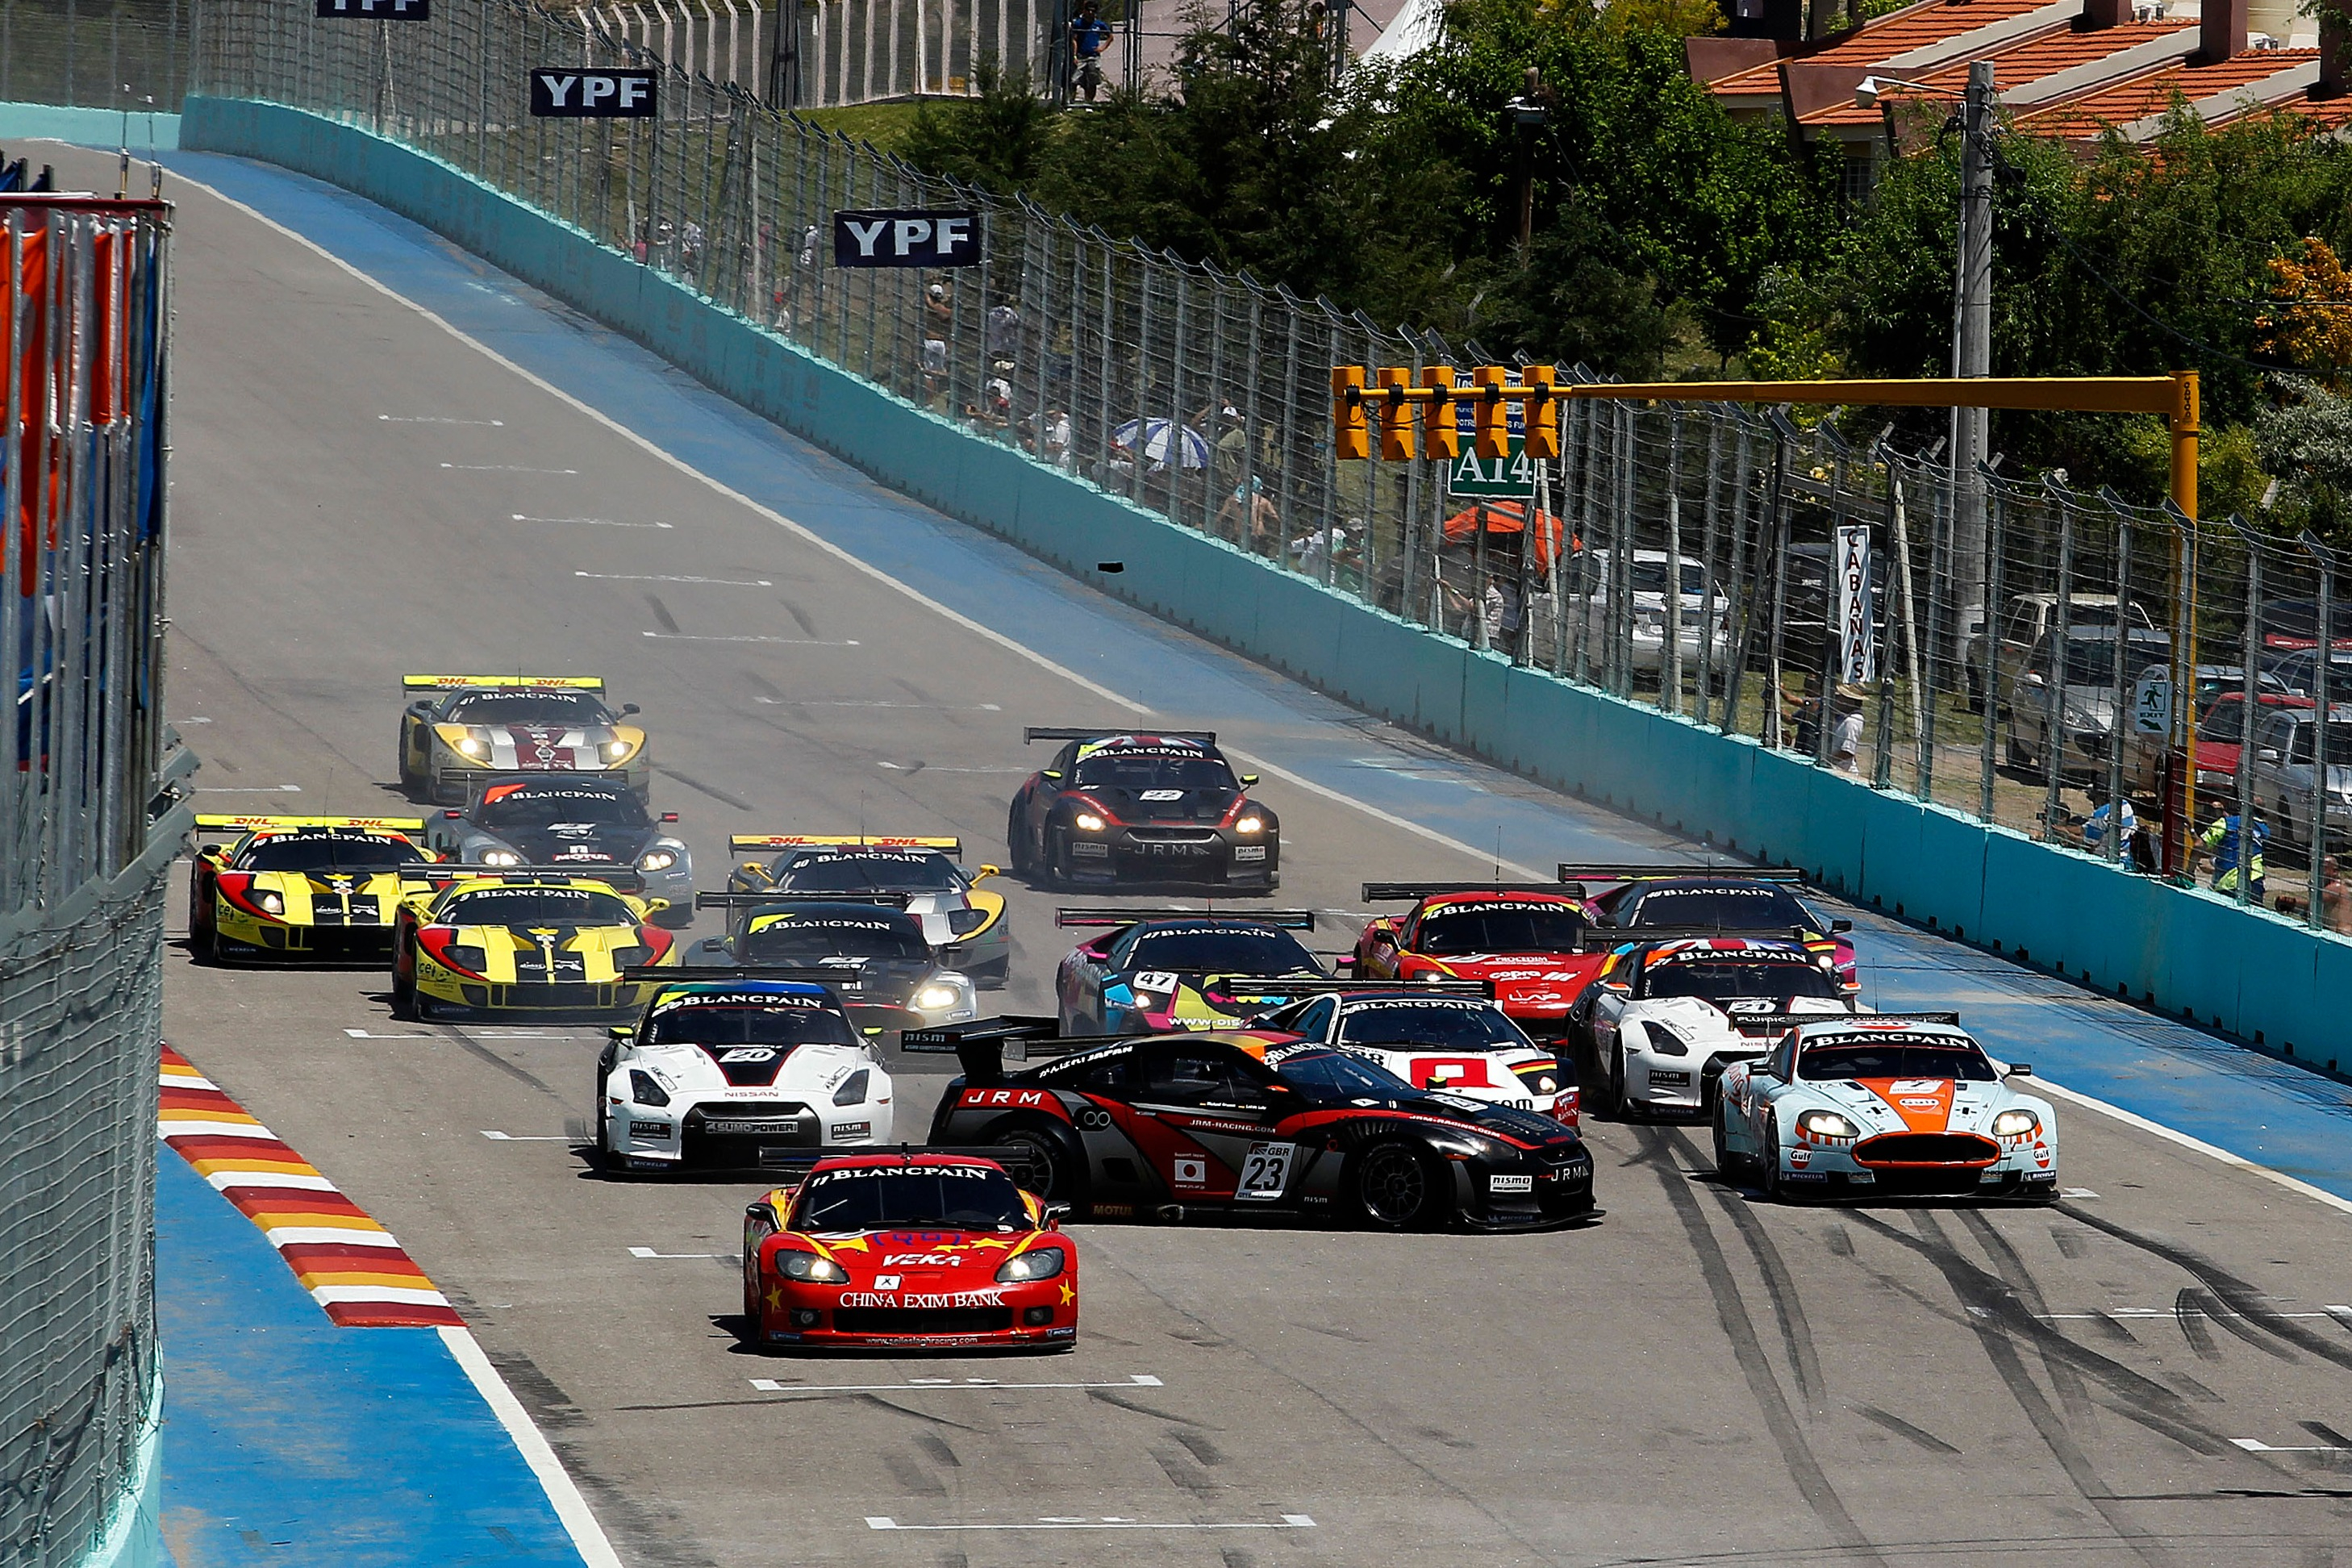 FIA GT1 2011 San Luis, start crash